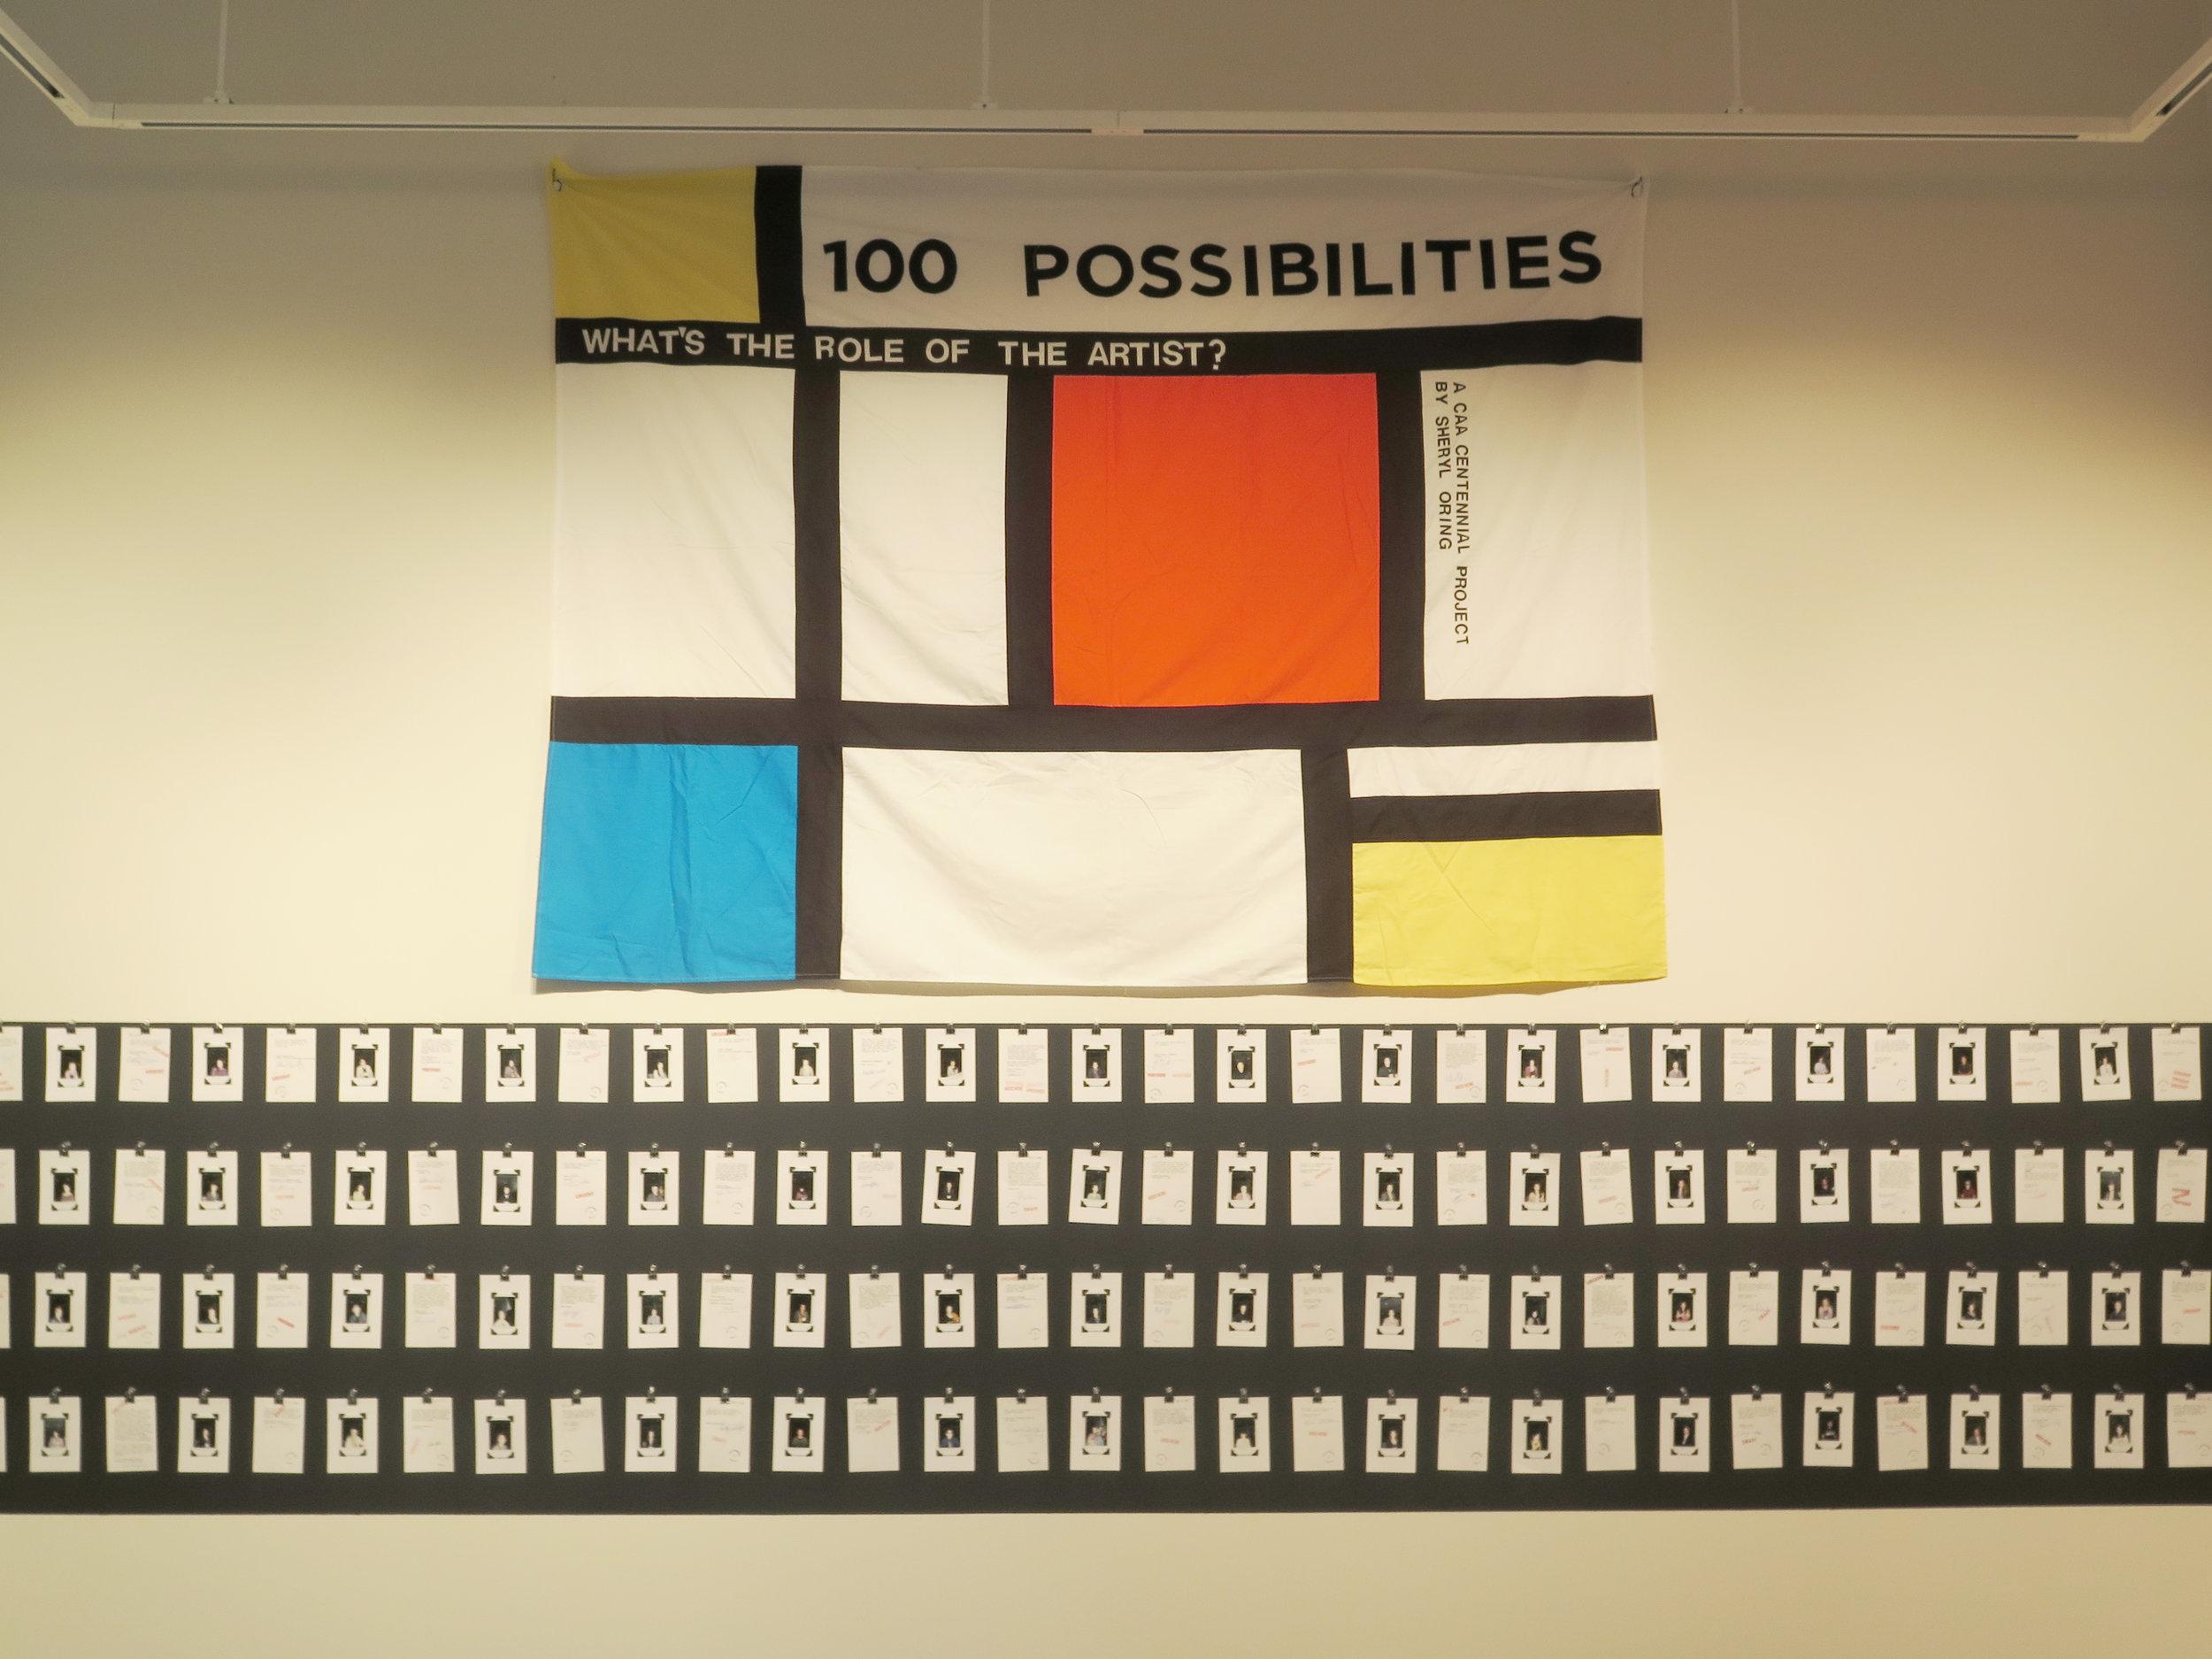 100 Possibilities